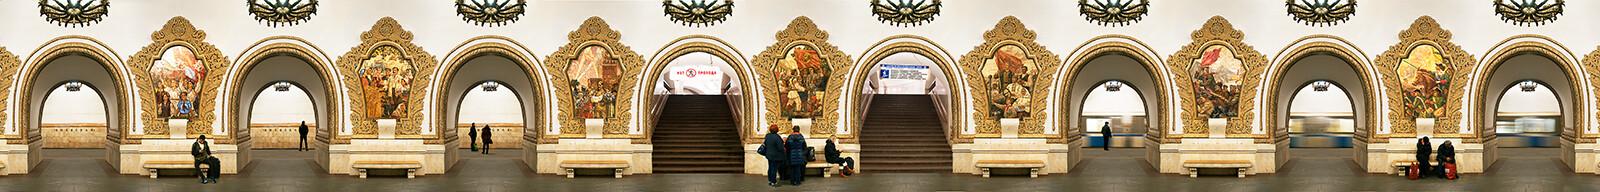 Moscow, Kievskaya, Circle Line - Larry Yust